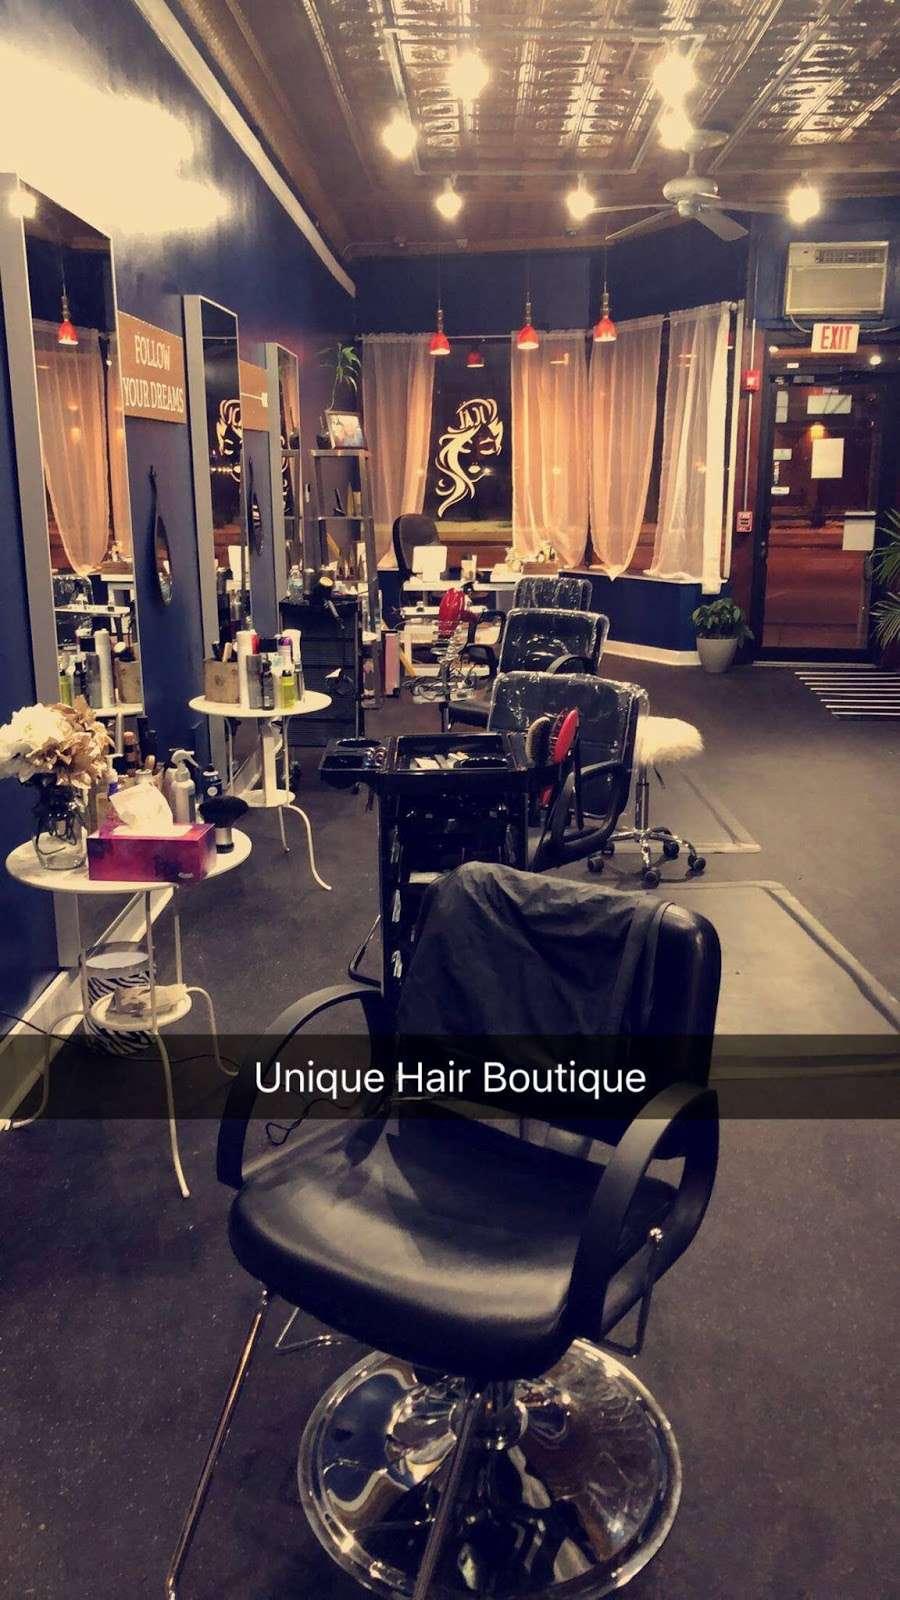 Unique Hair Boutique - hair care    Photo 3 of 10   Address: 7442 W Grand Ave, Elmwood Park, IL 60707, USA   Phone: (708) 395-5897